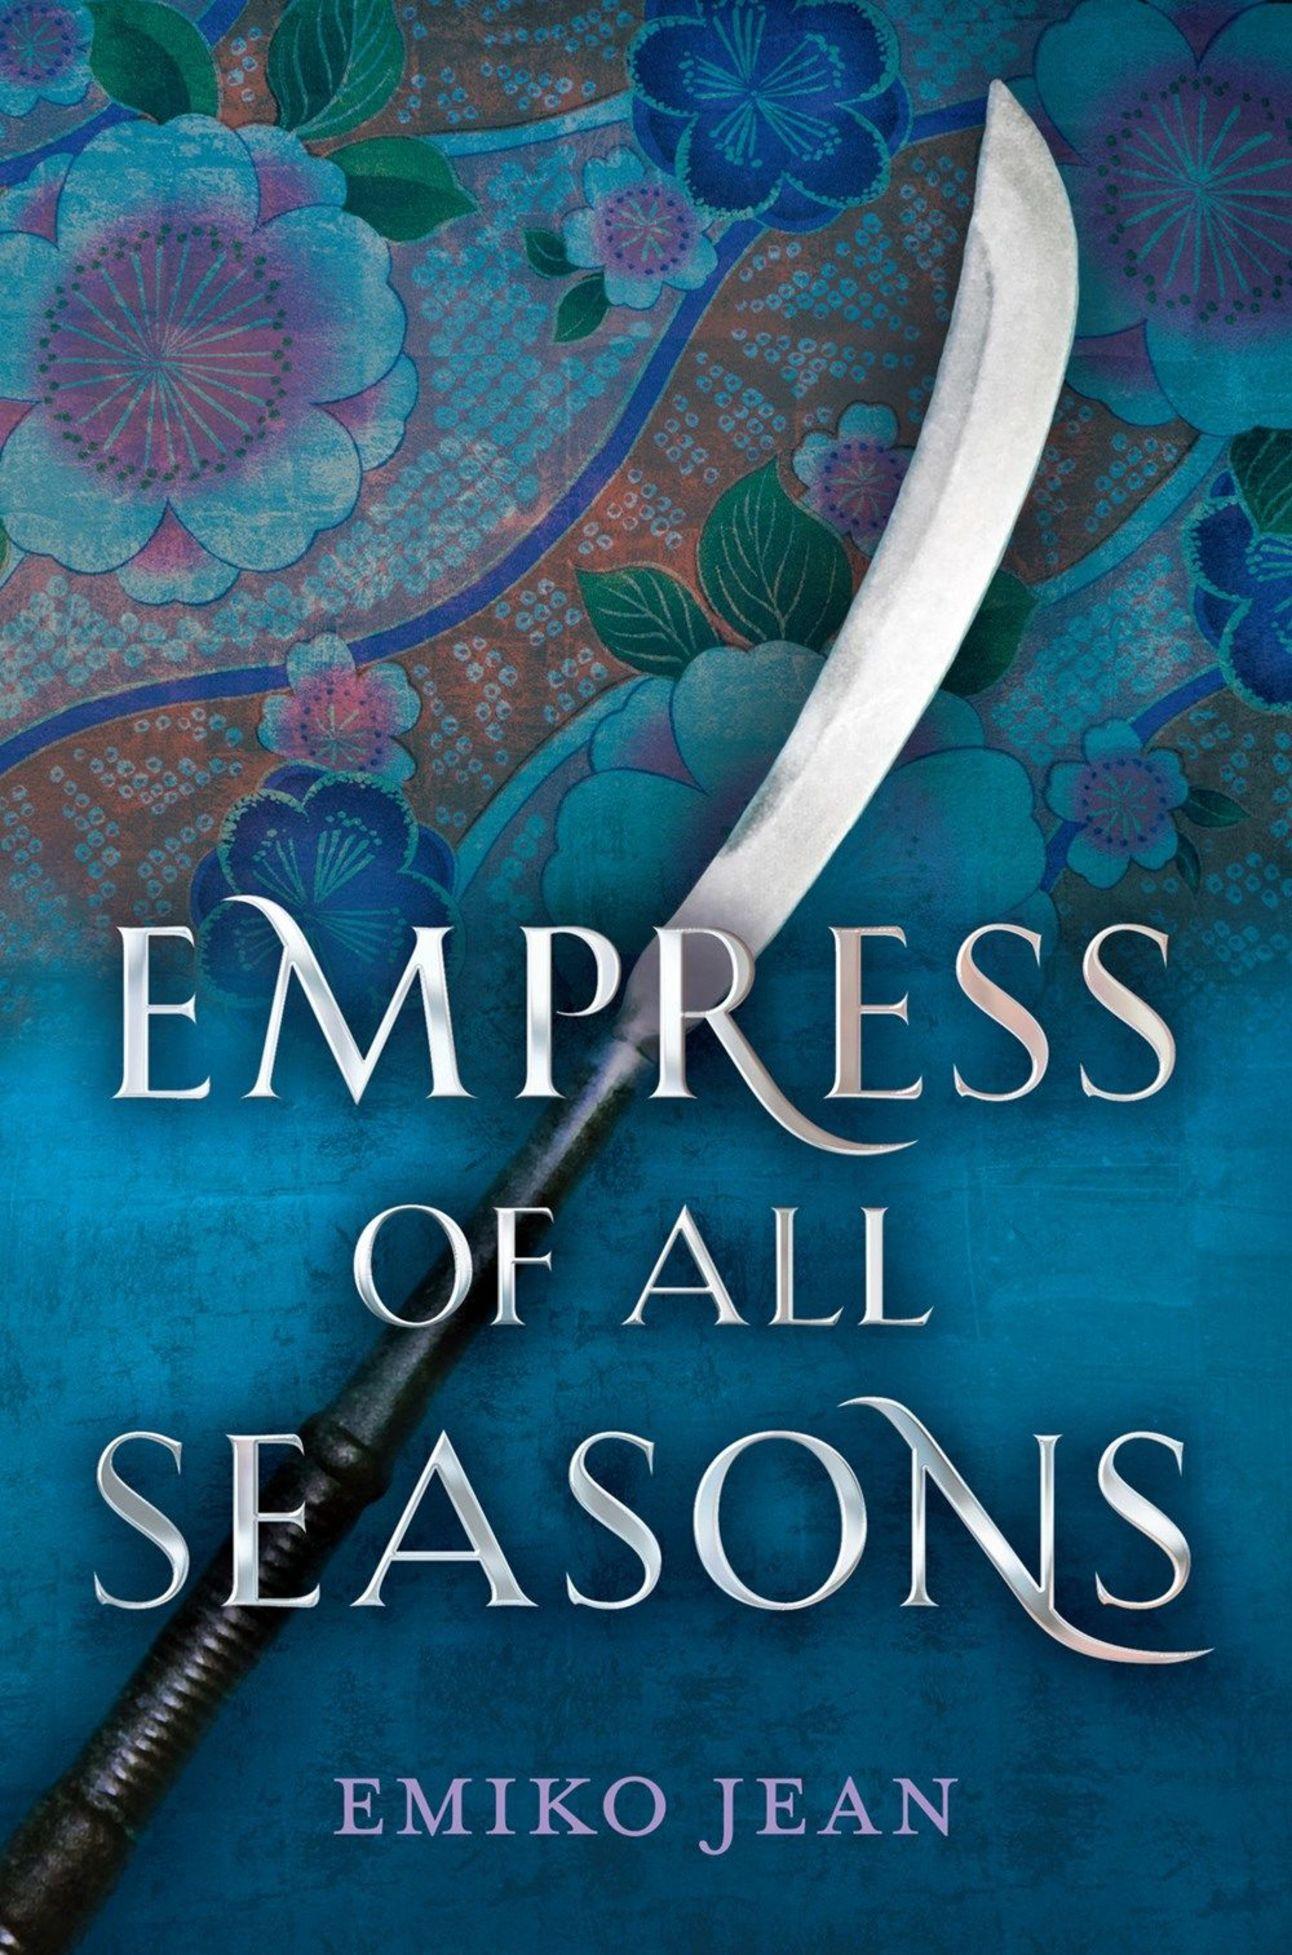 empress-of-all-seasons-emiko-jean